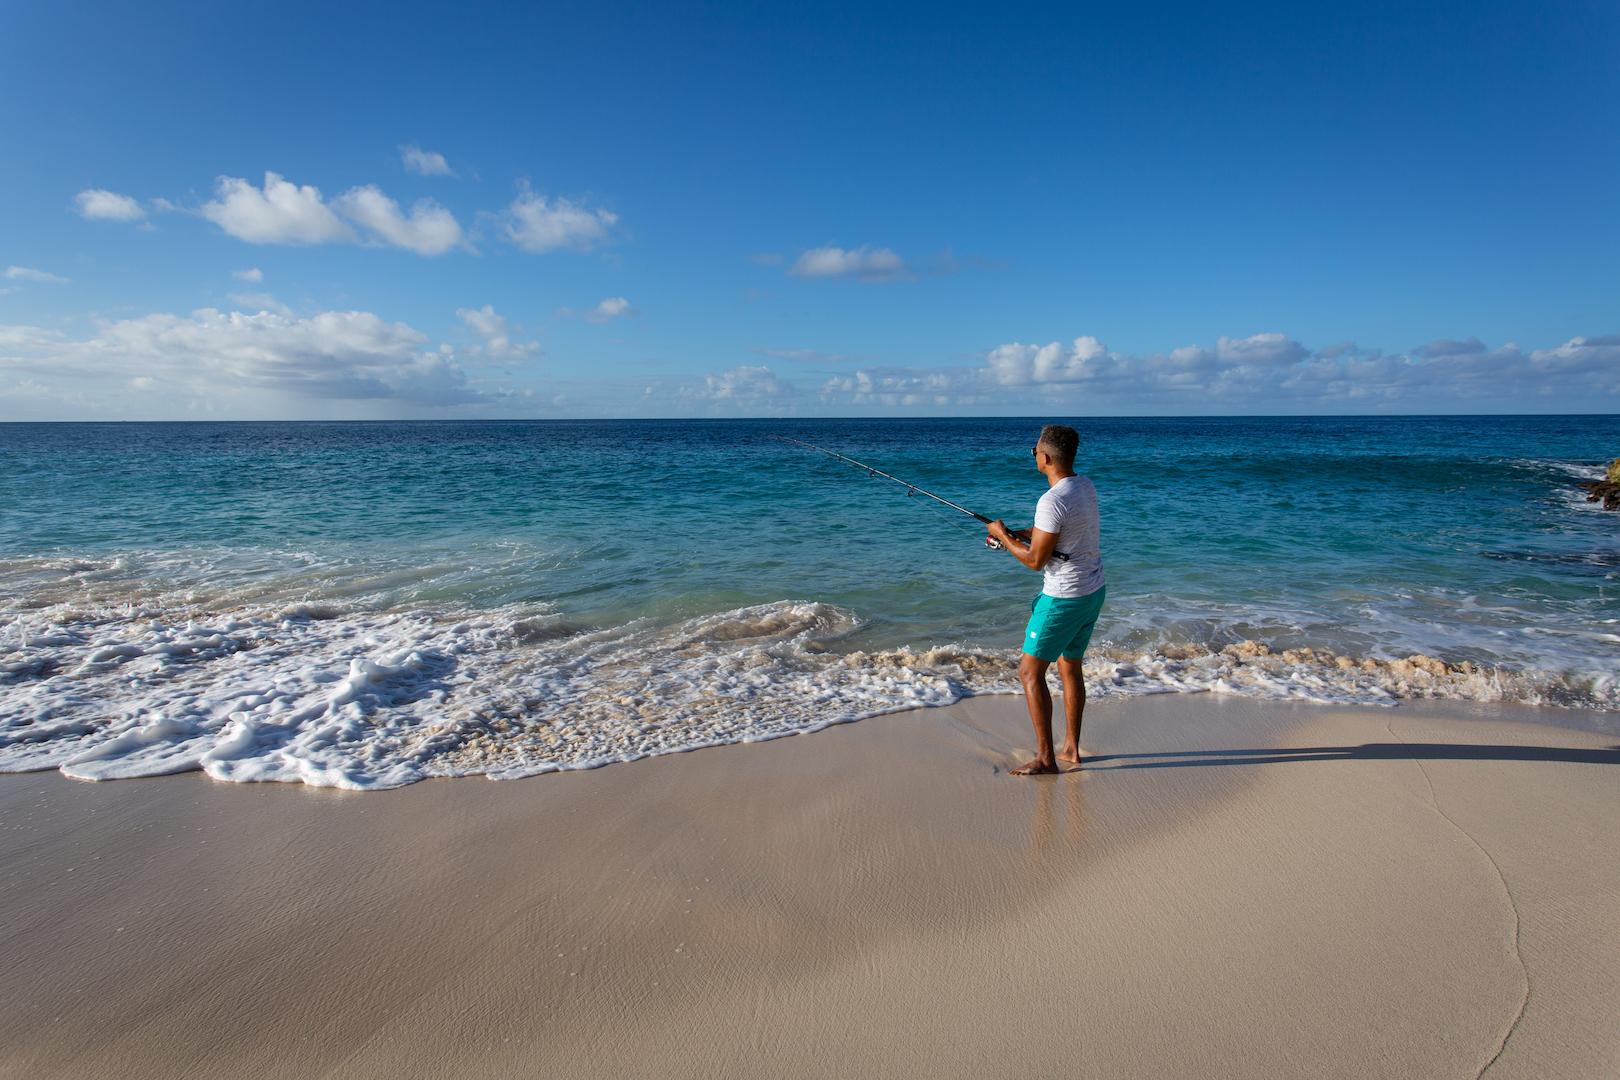 Man Fishing on Limestone Bay